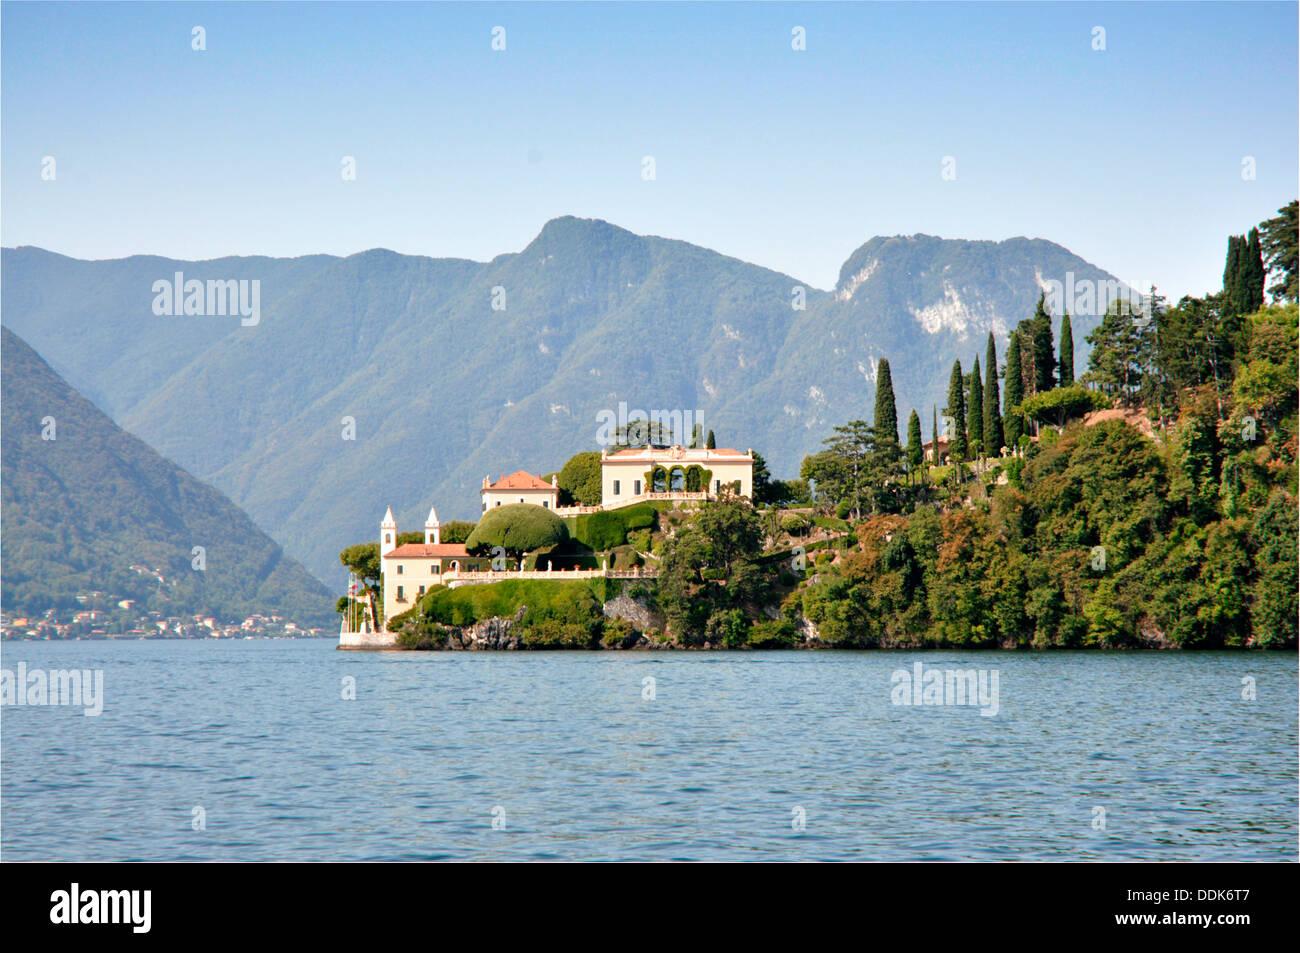 Italy - Lake Como - Lenno - Villa del Balbianello -  on the tip of Punta di Lavedo peninsula - lake view - mountain backdrop. Stock Photo